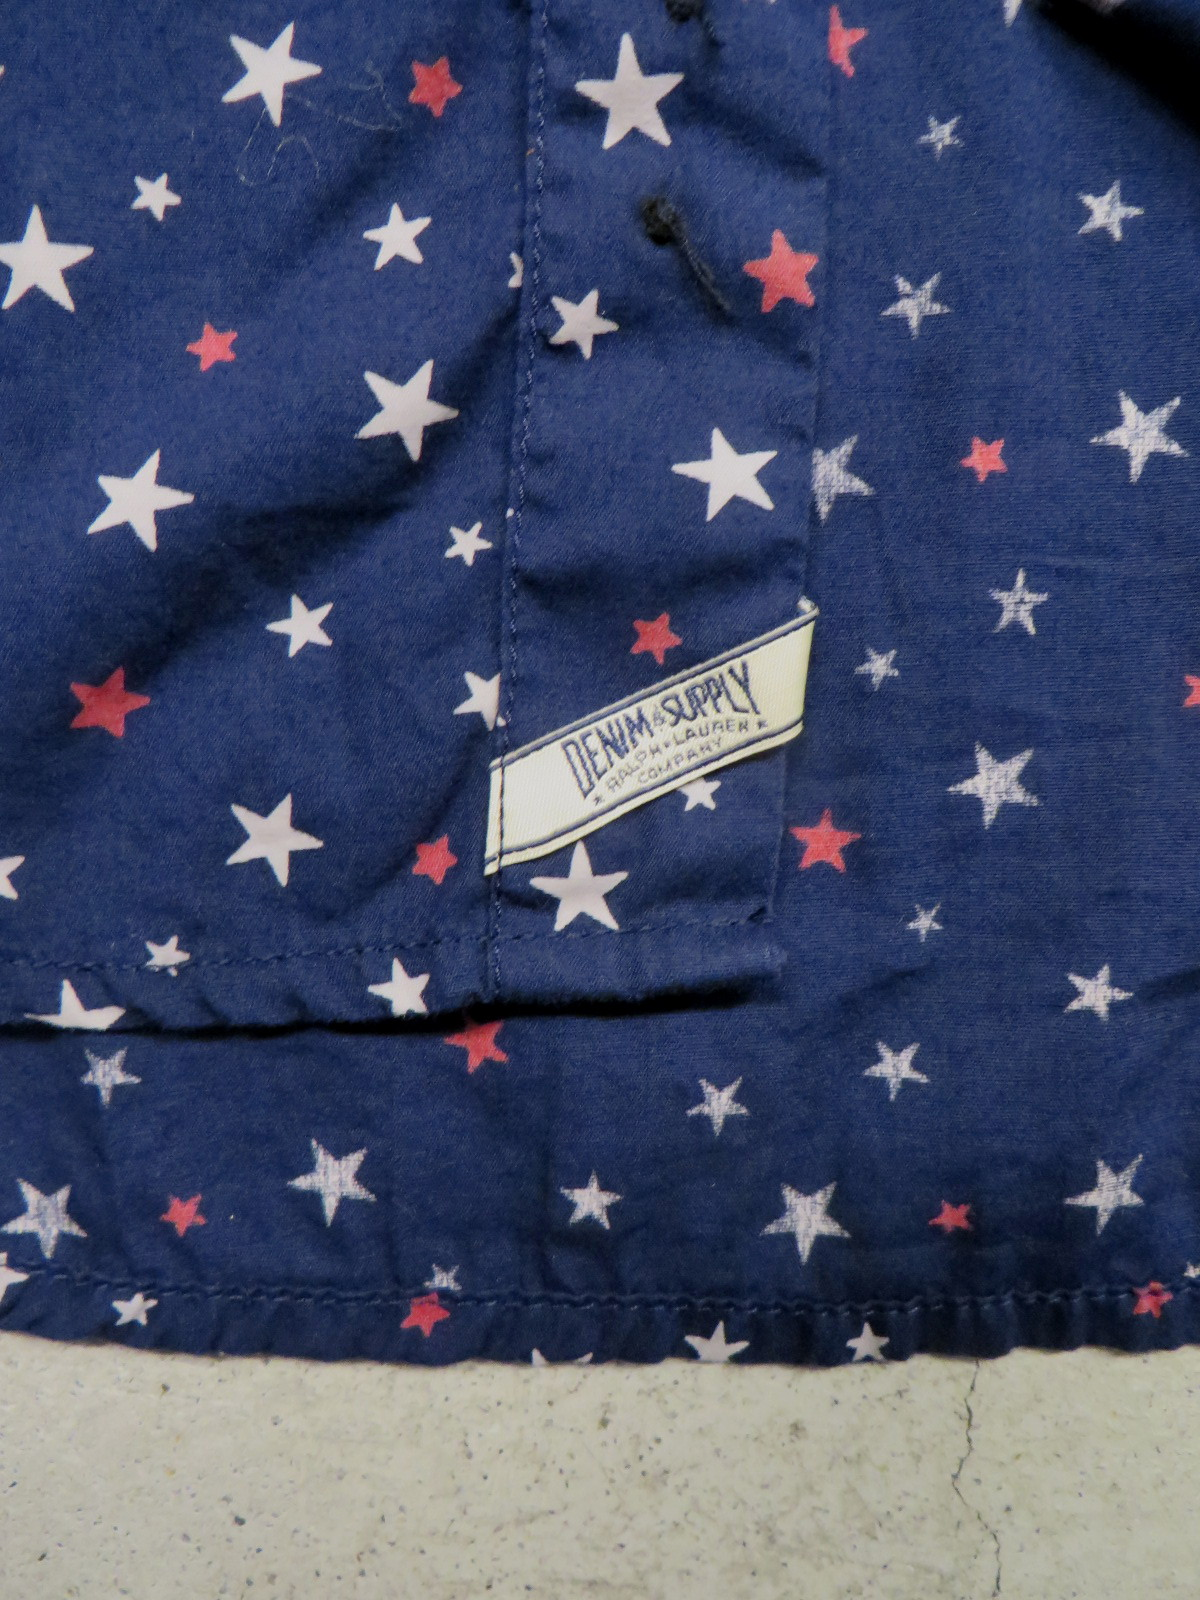 Bristy Blog 【denim Amp Supply】ファンには嬉しい星条旗アイテム